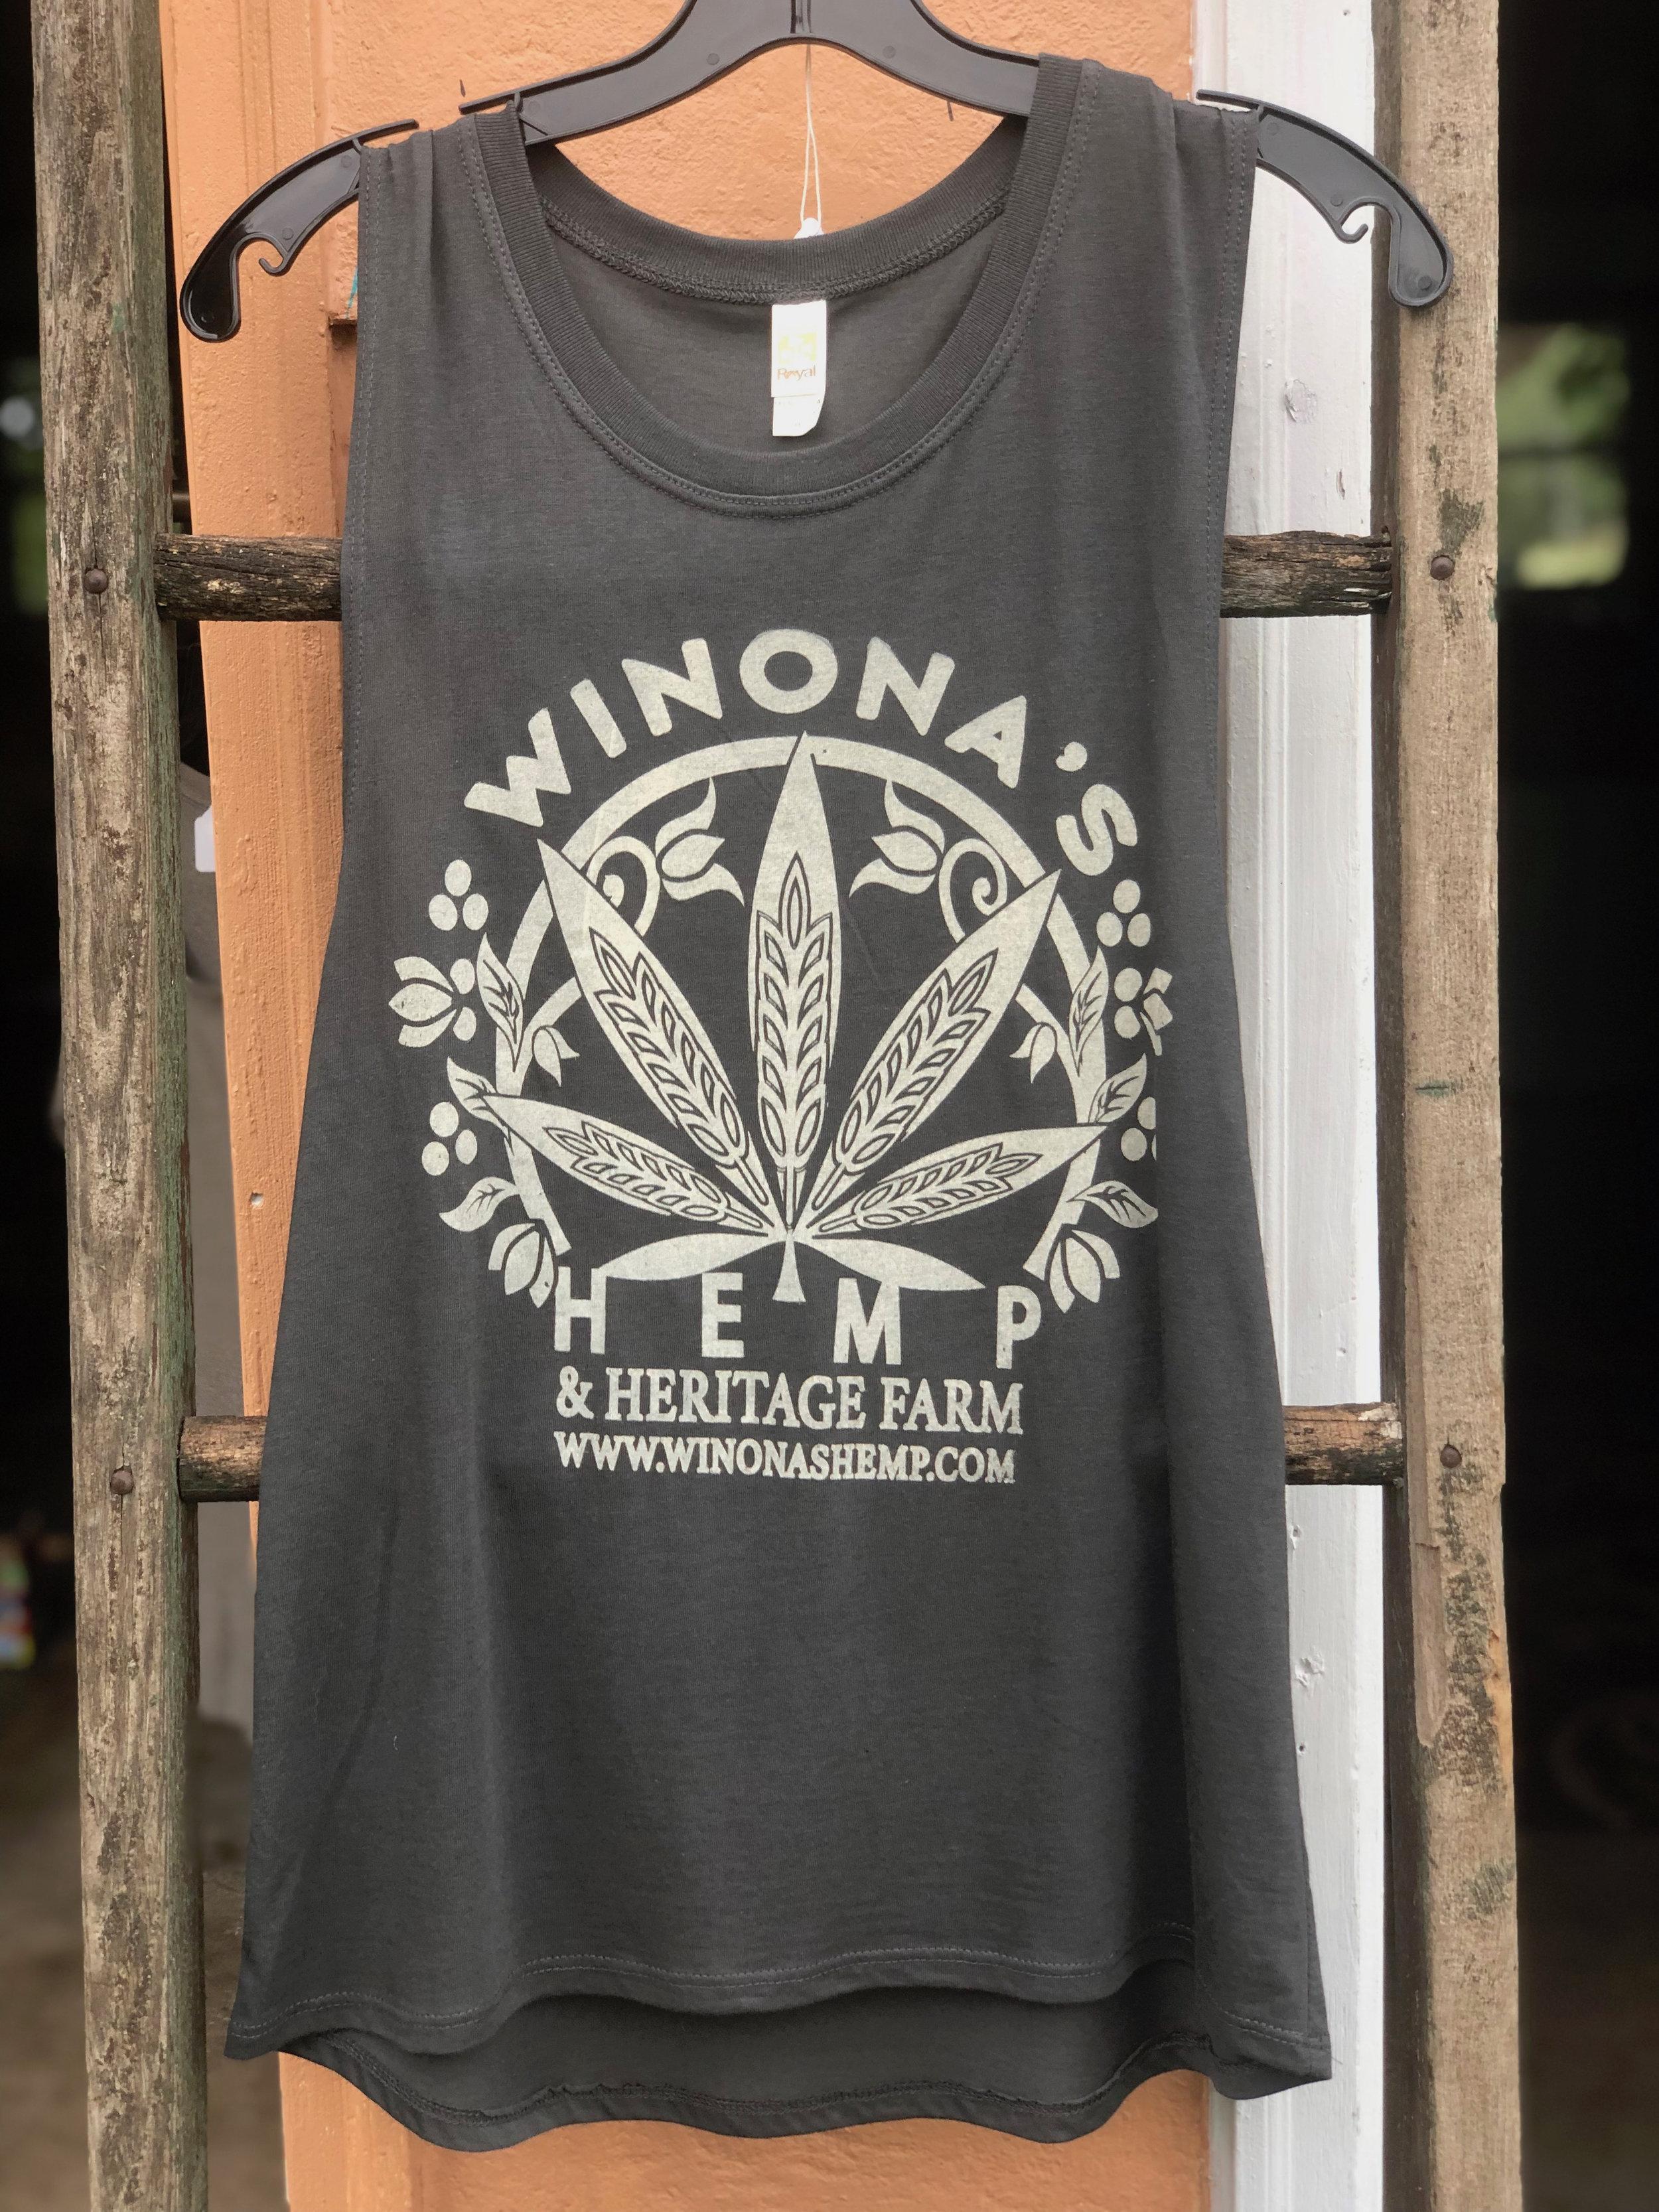 Winona S Hemp Women S Bamboo Organic Cotton Muscle Shirt Winona S Hemp Heritage Farm